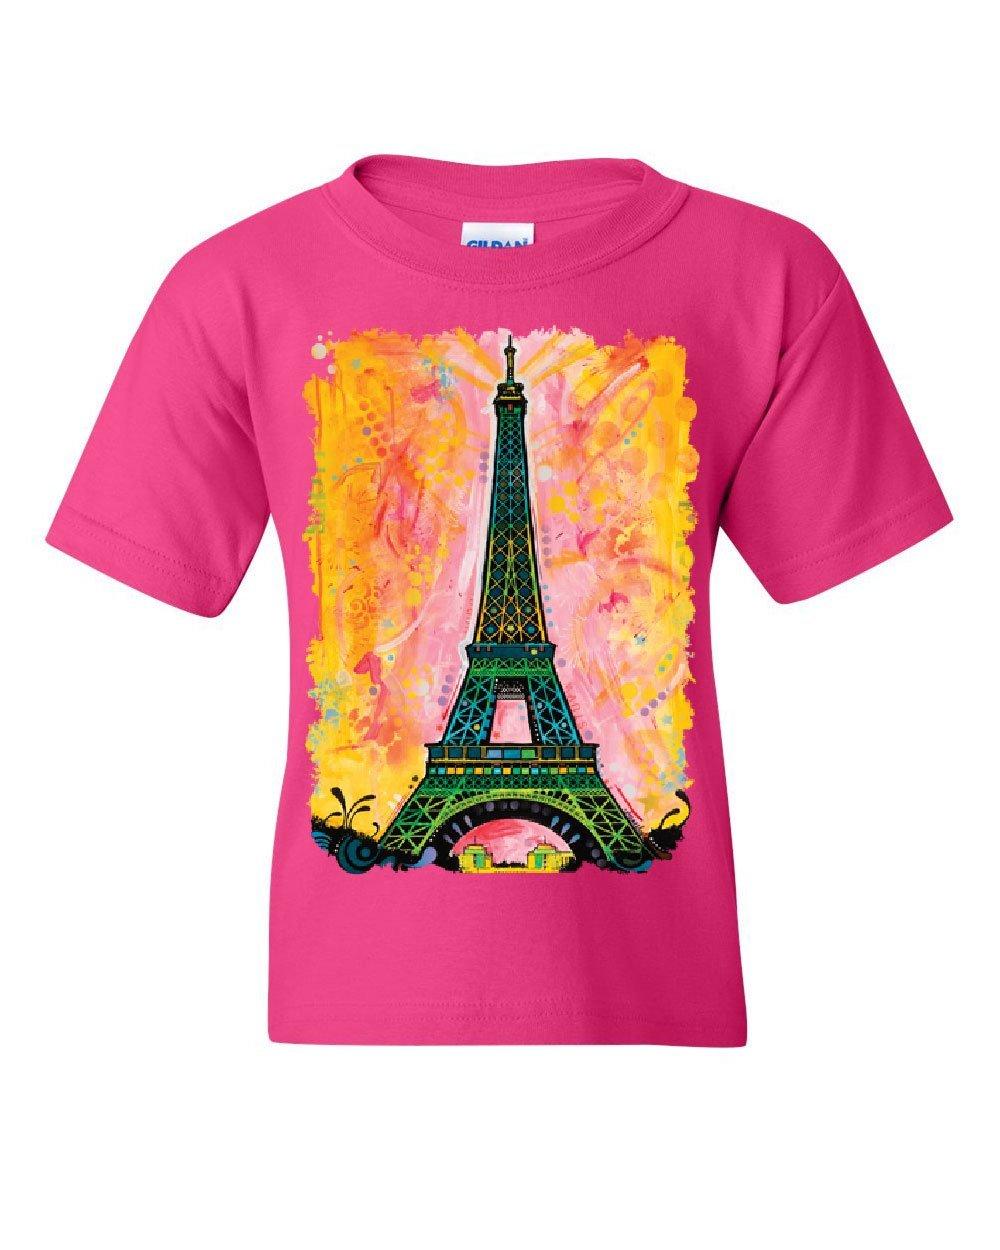 Eiffel Tower Youth T-Shirt Dean Russo Paris France Travel Europe EU Kids Tee Pink L